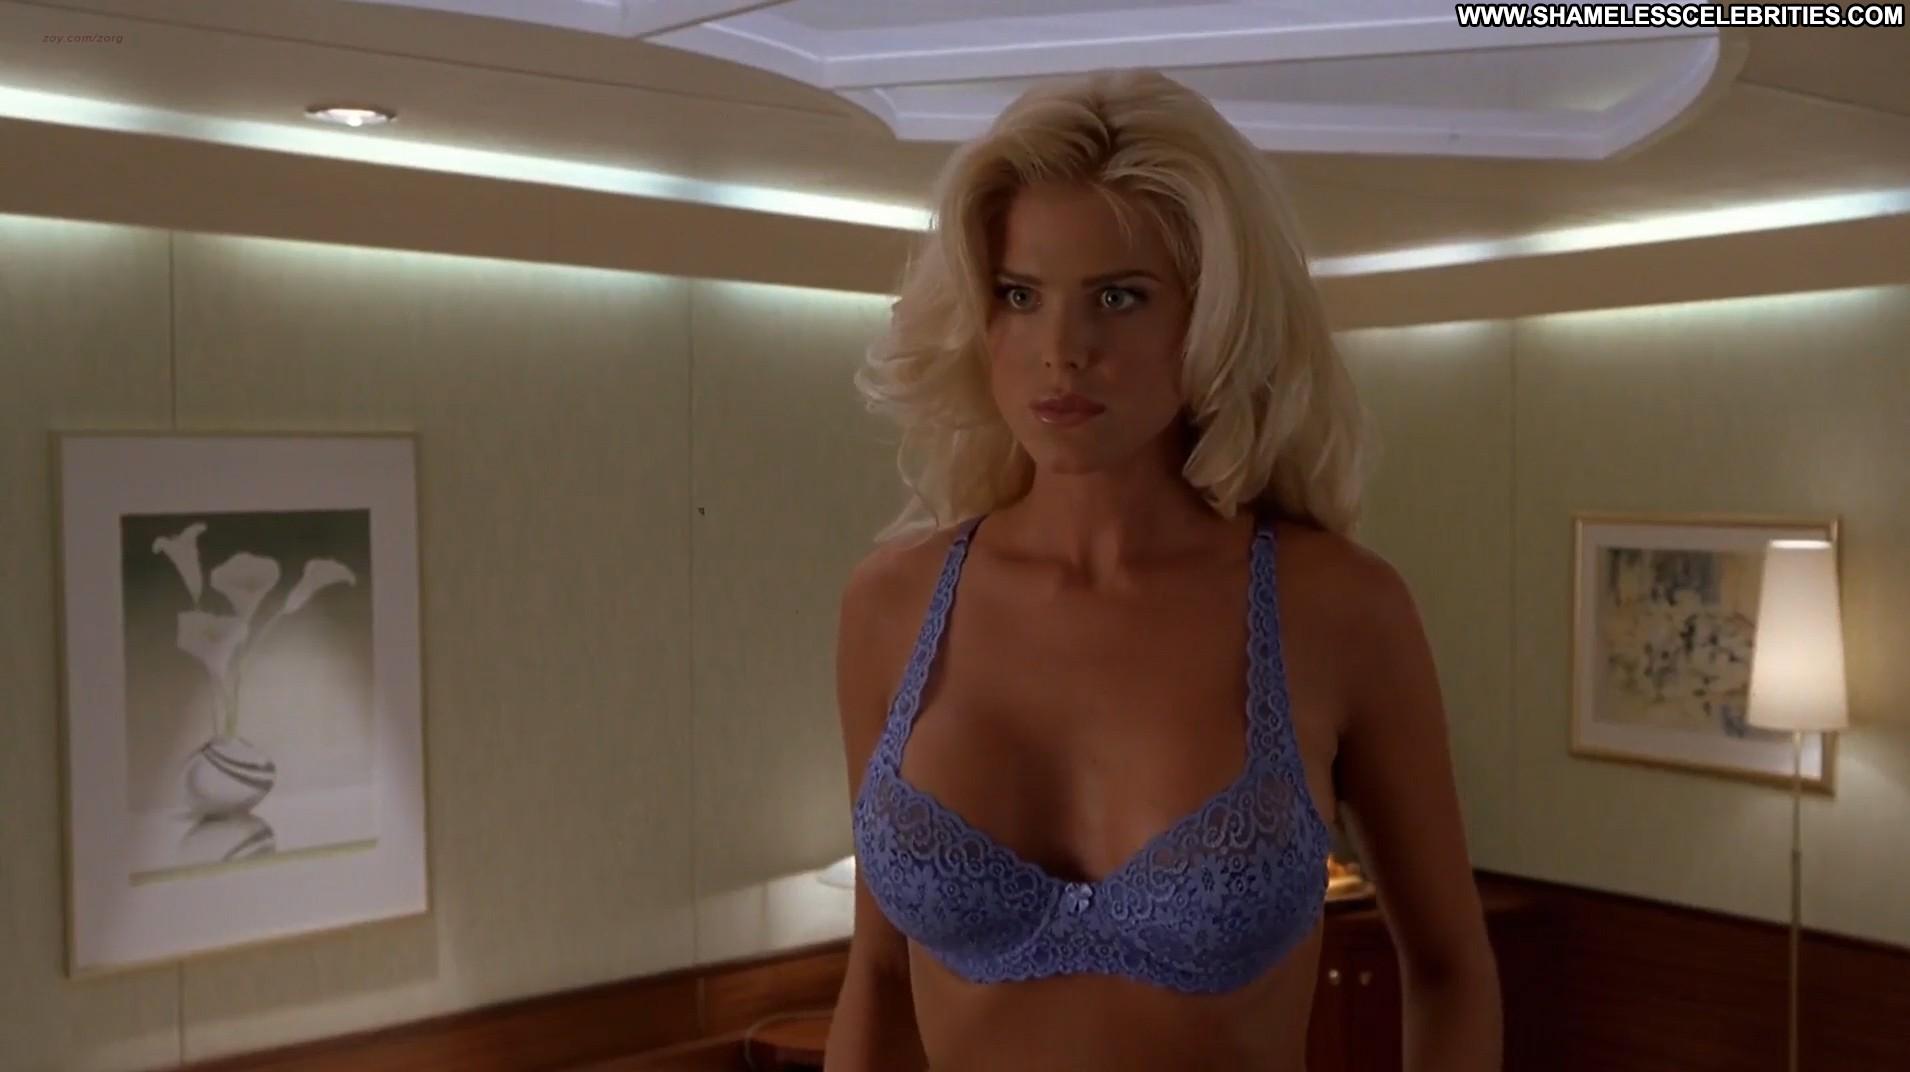 vivica a fox boat trip celebrity posing hot nude bikini topless hot